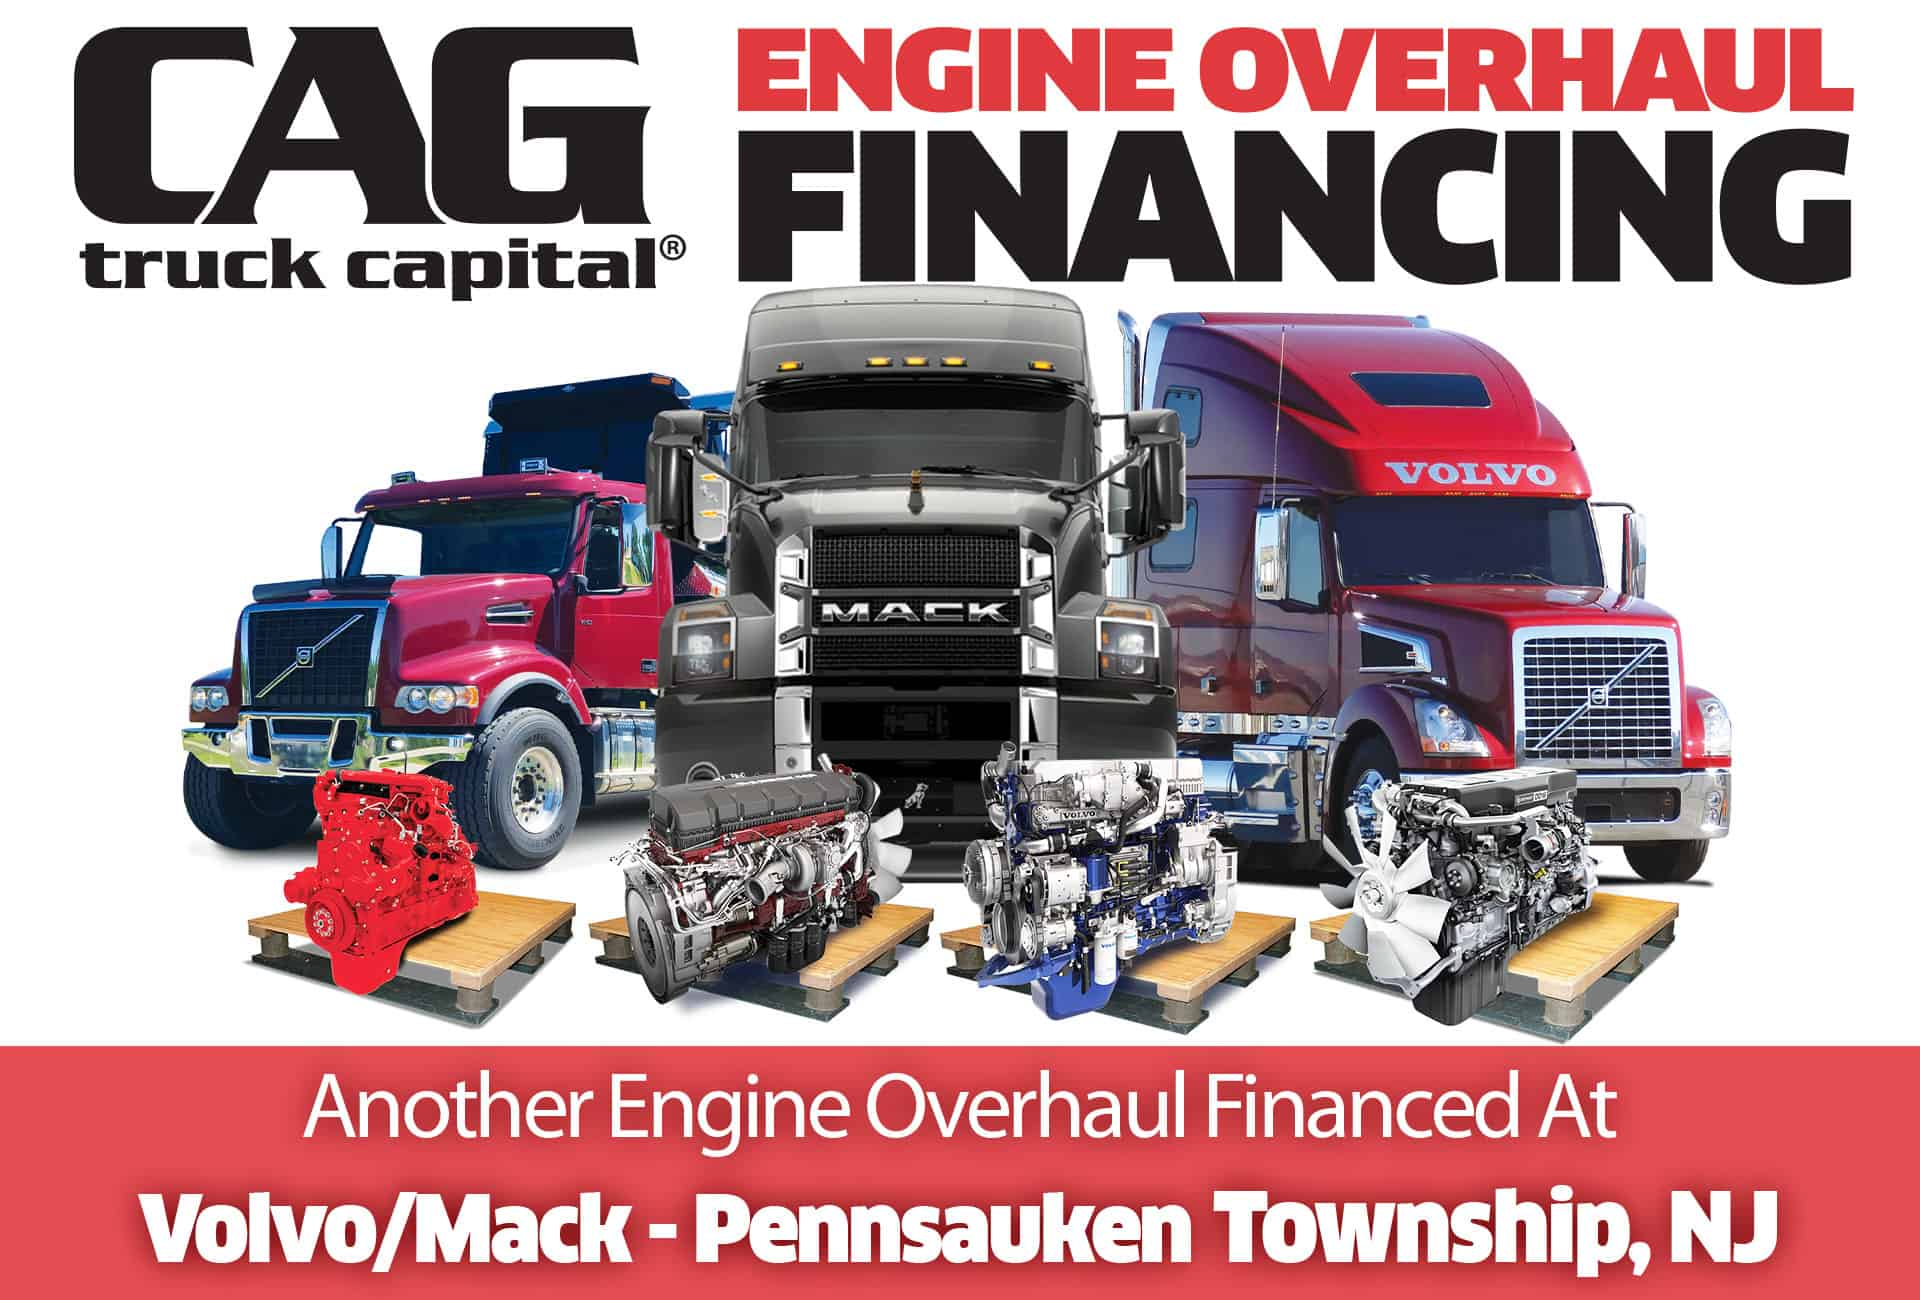 Volvo/Mack Engine Overhauls In Pennsauken Township, NJ